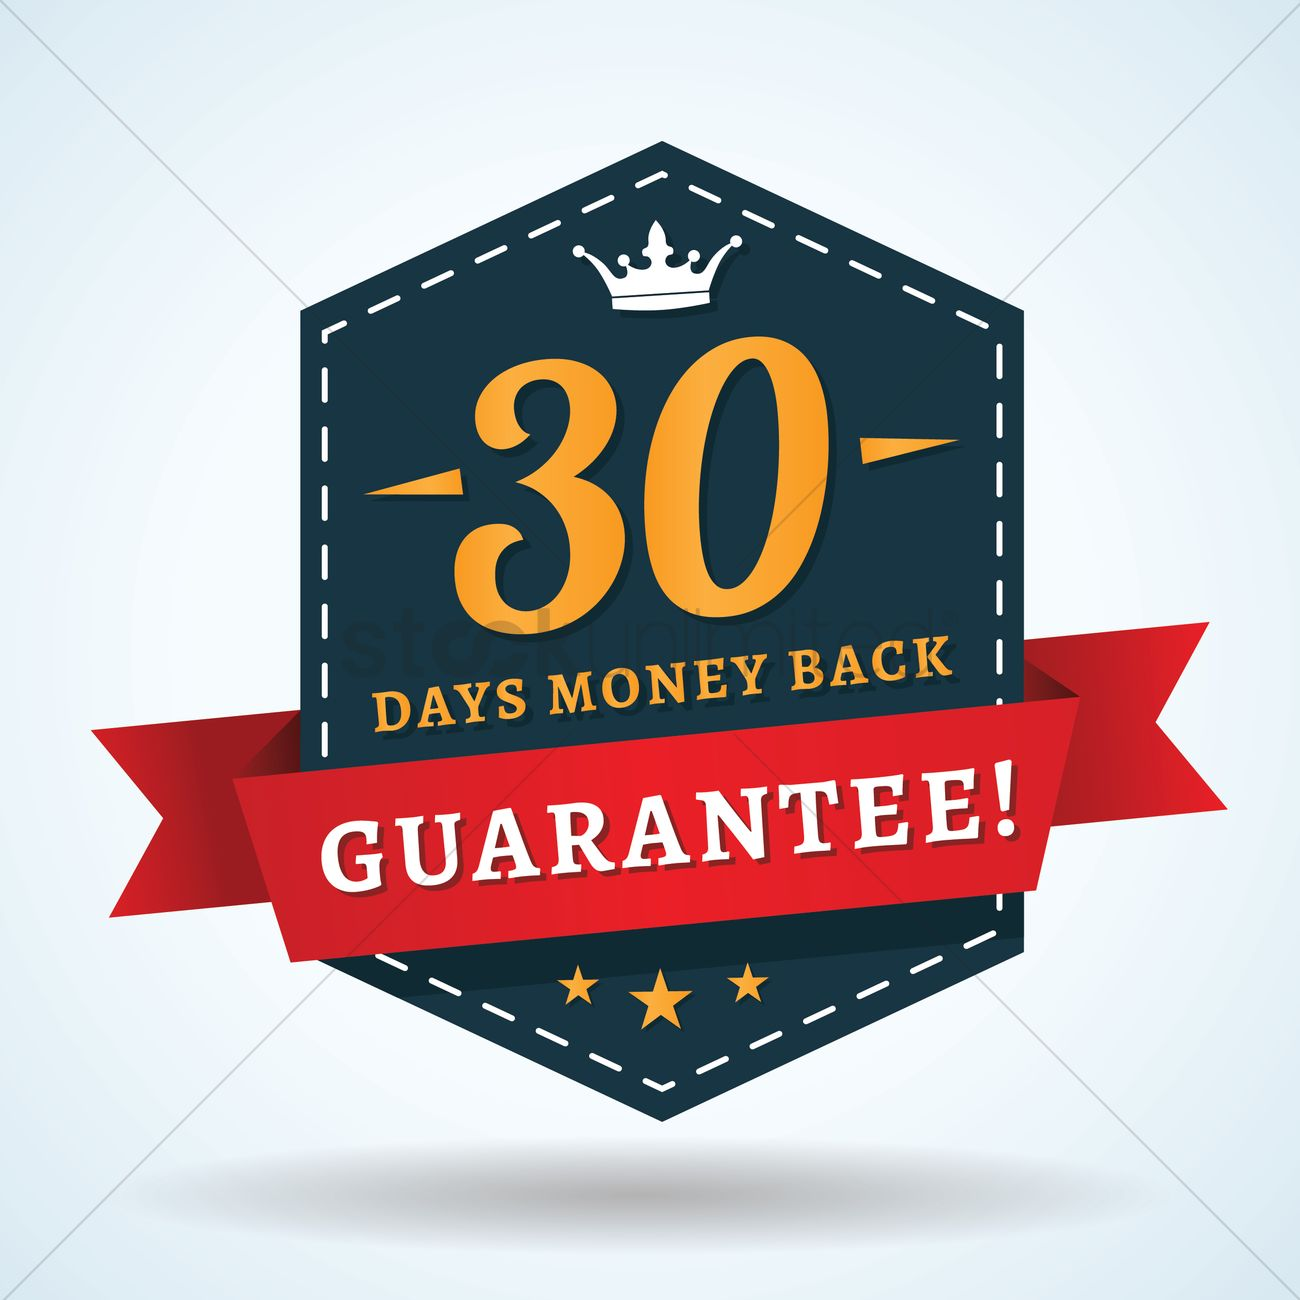 1300x1300 30 Days Money Back Guarantee Vector Image